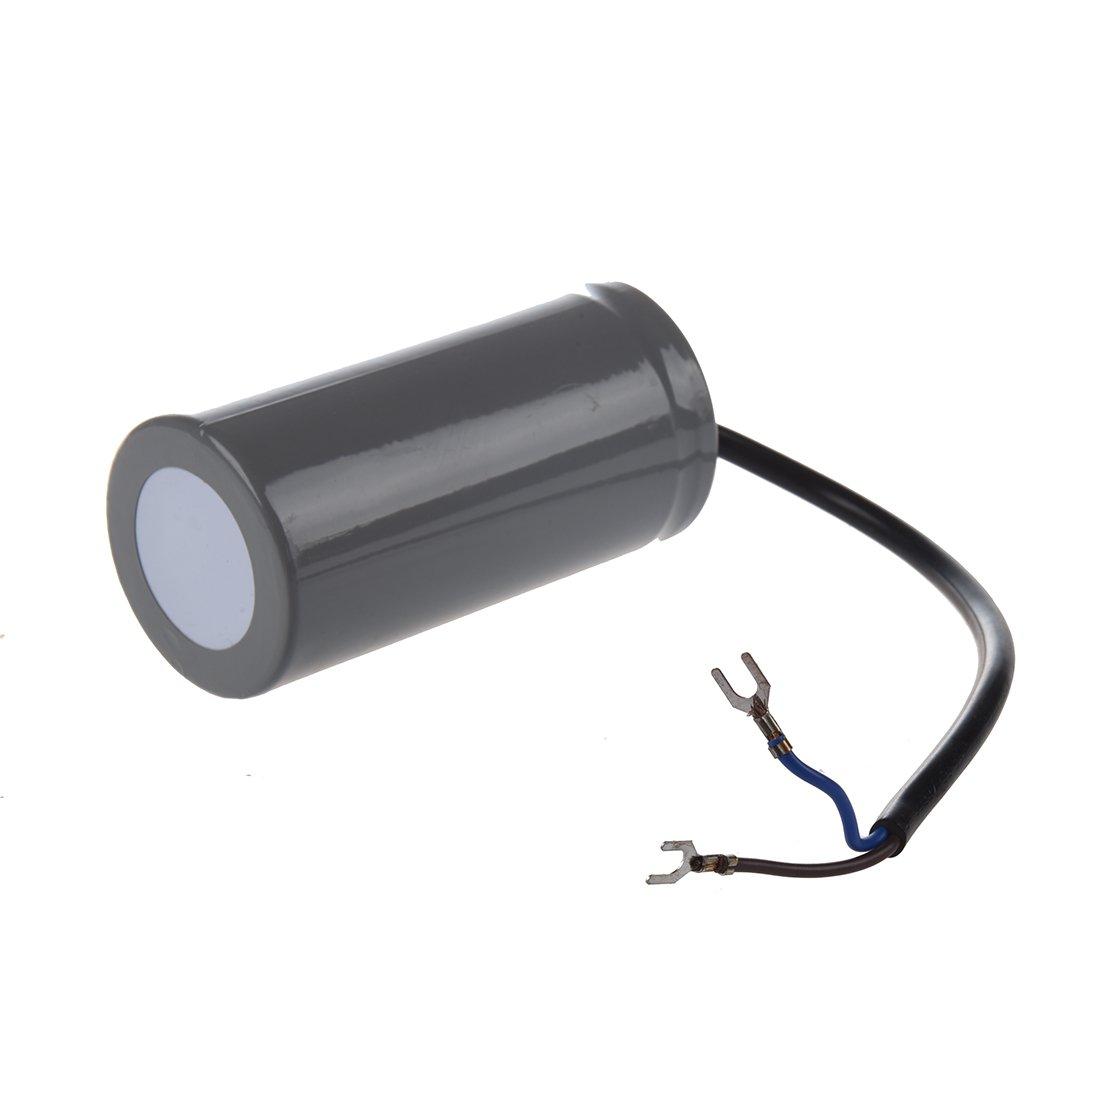 R CD60 AC 250V 150uF Verdrahteter Einphasenmotor Start Kondensator Grau Einphasenmotor TOOGOO